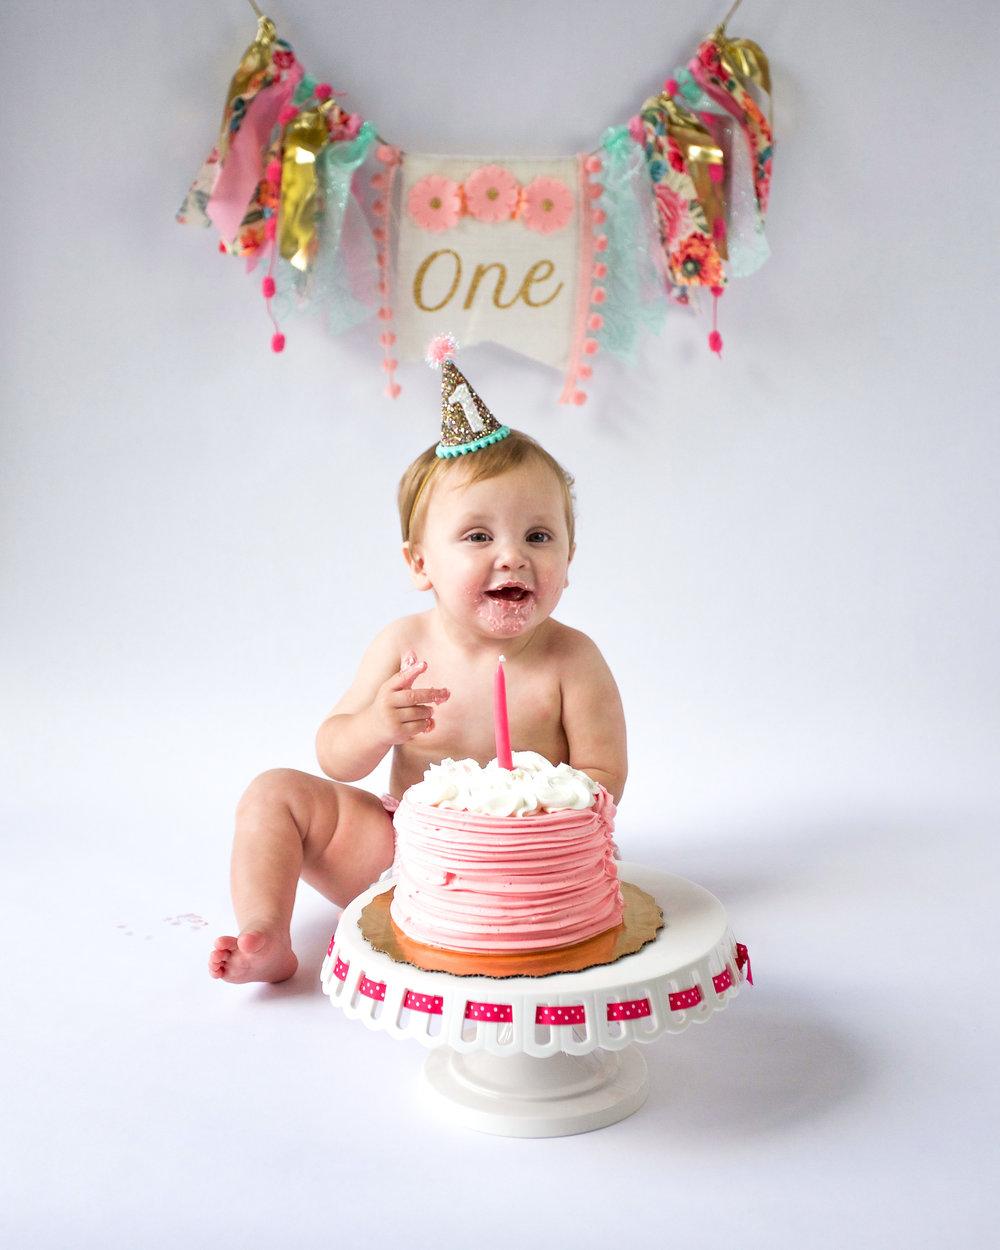 Johns Creek Cake Smash Photographer